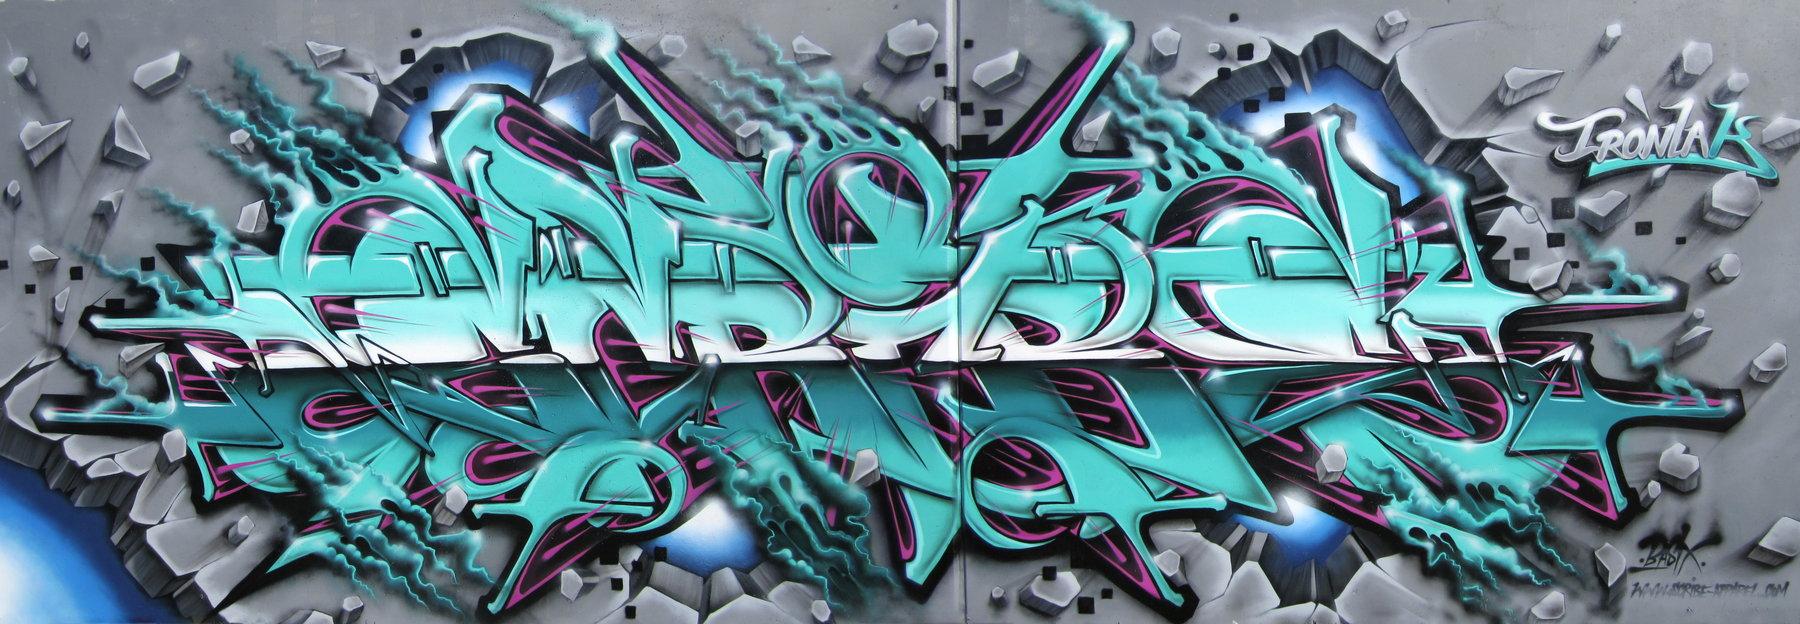 Art Crimes Basix P 3